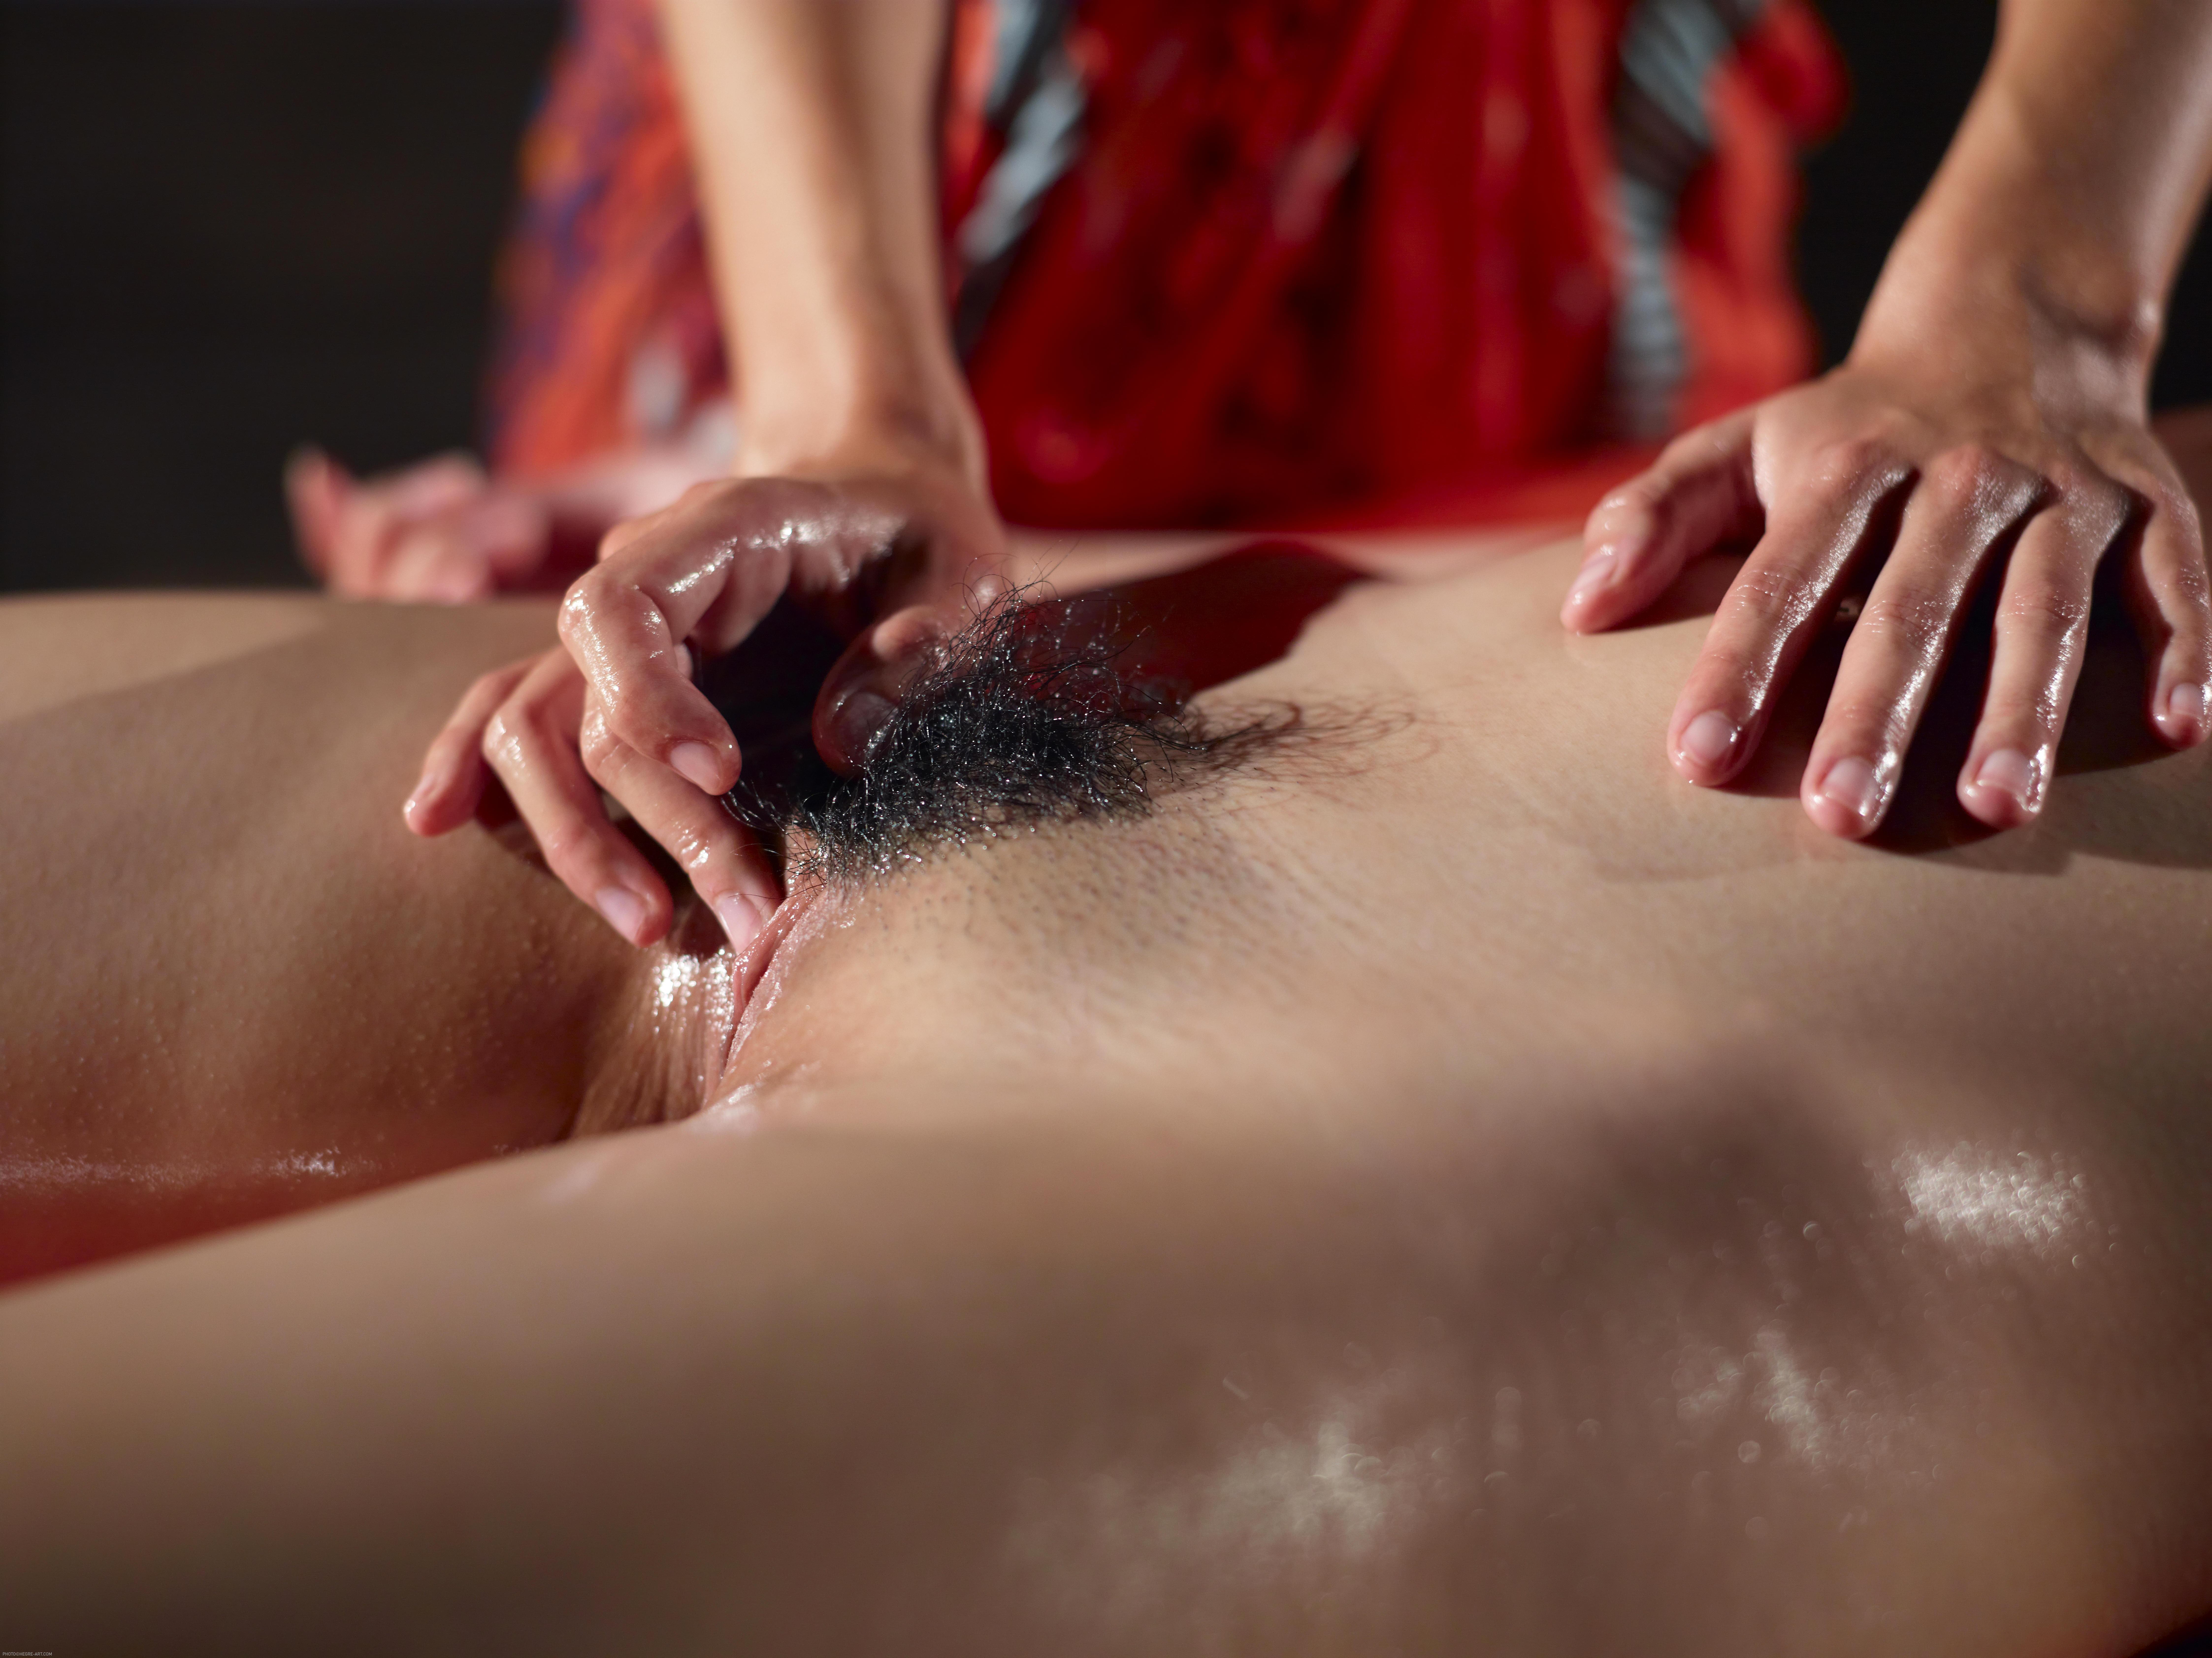 homo yoni massage hvordan escort search sites